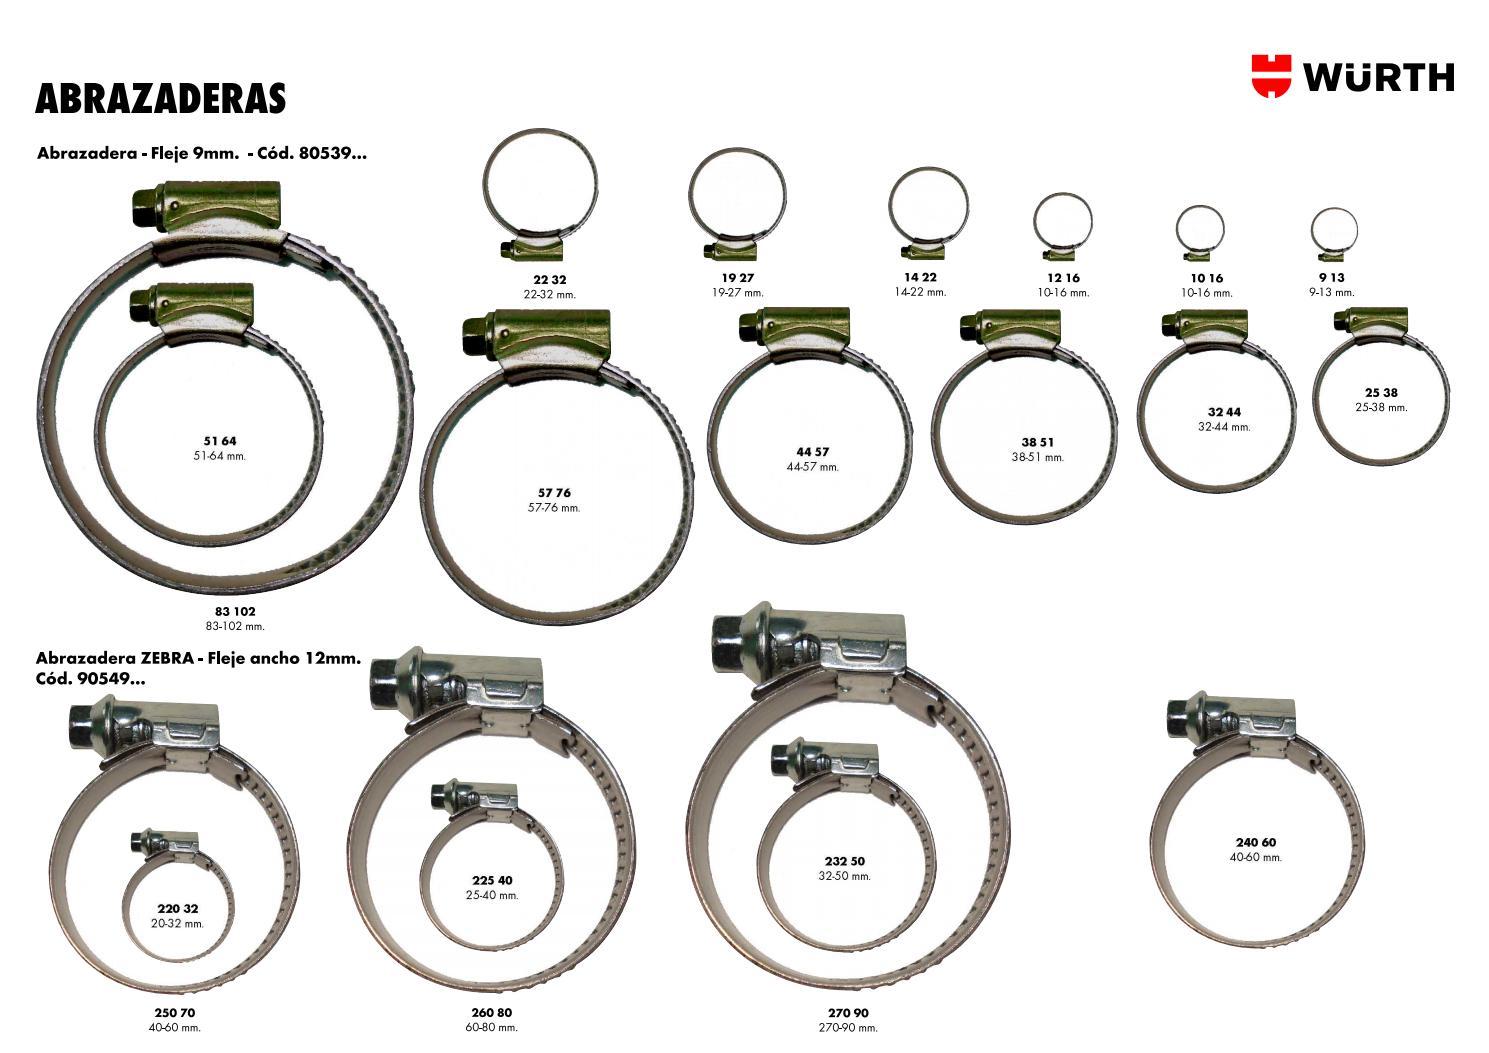 Pernos De Bloqueo De Rueda 12x1.25 Tuercas Cónicos Para Fiat Stilo 02-09